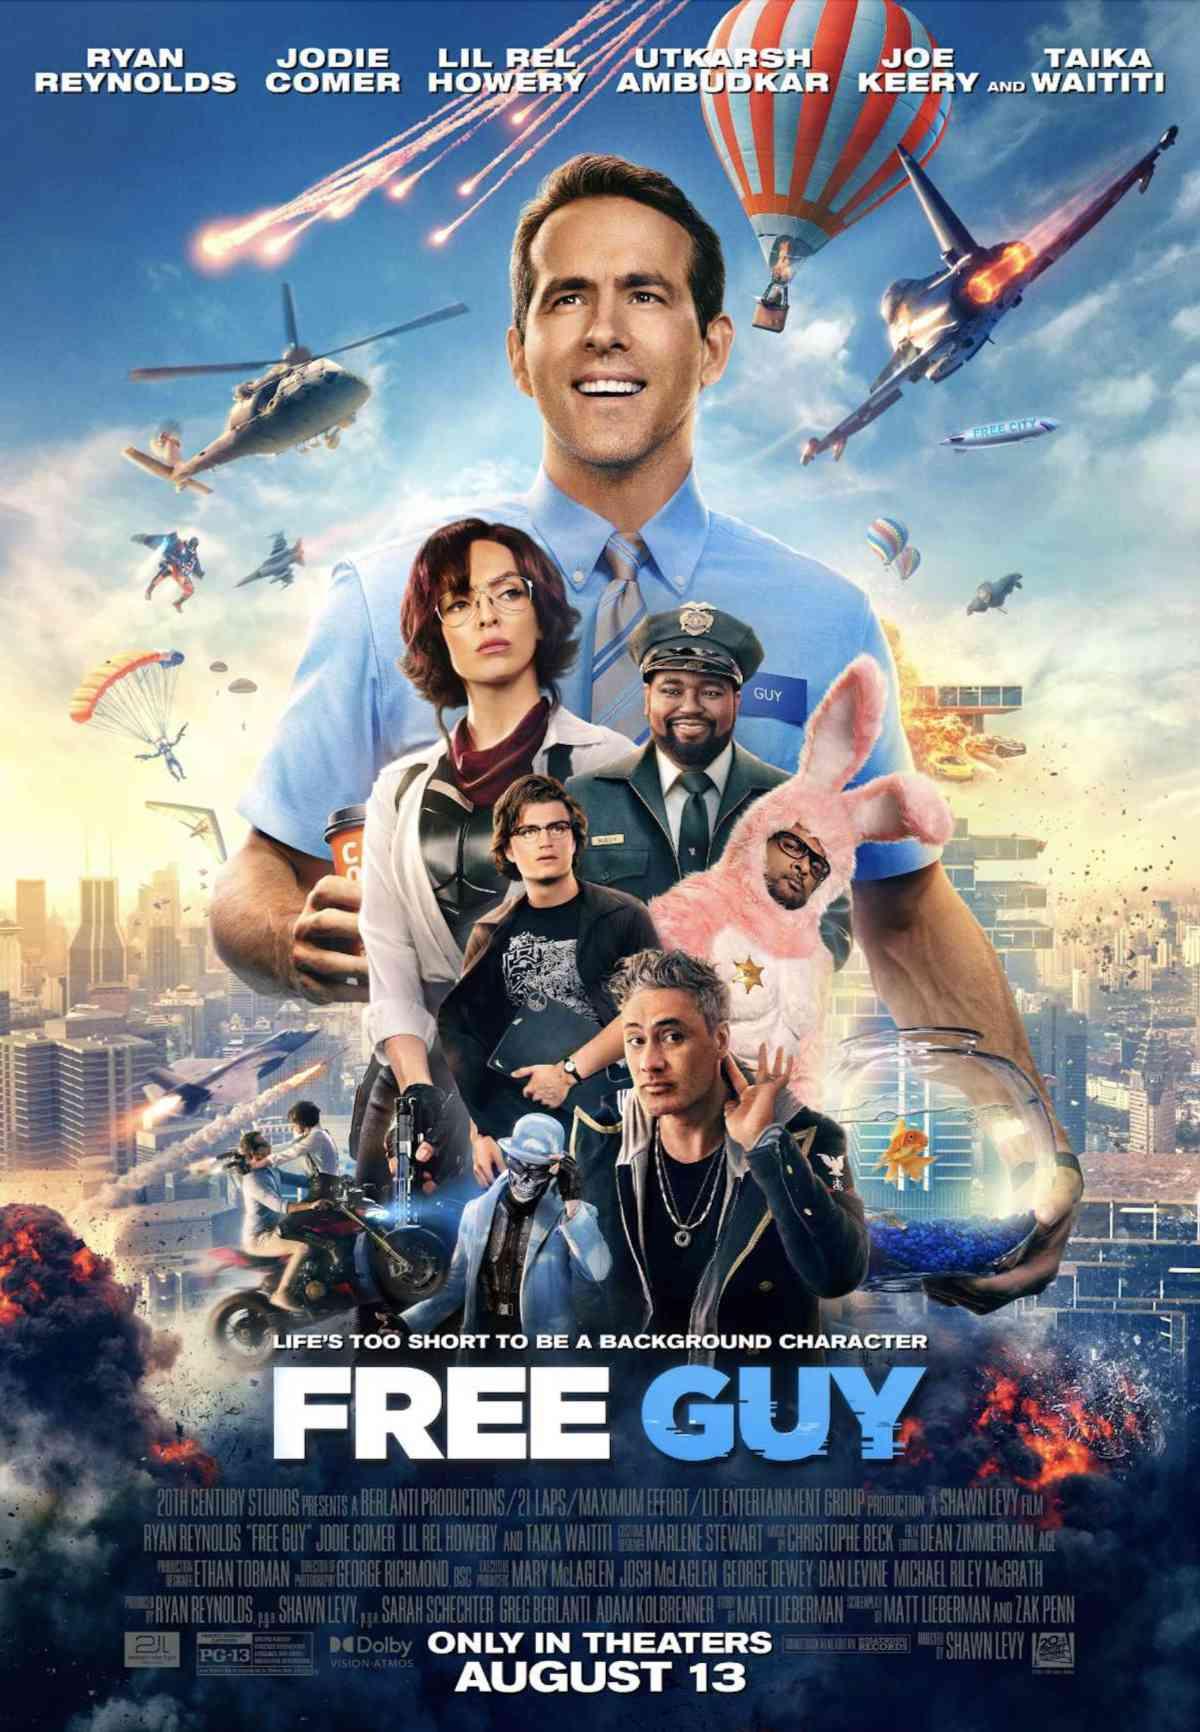 Free Guy Movie Poster